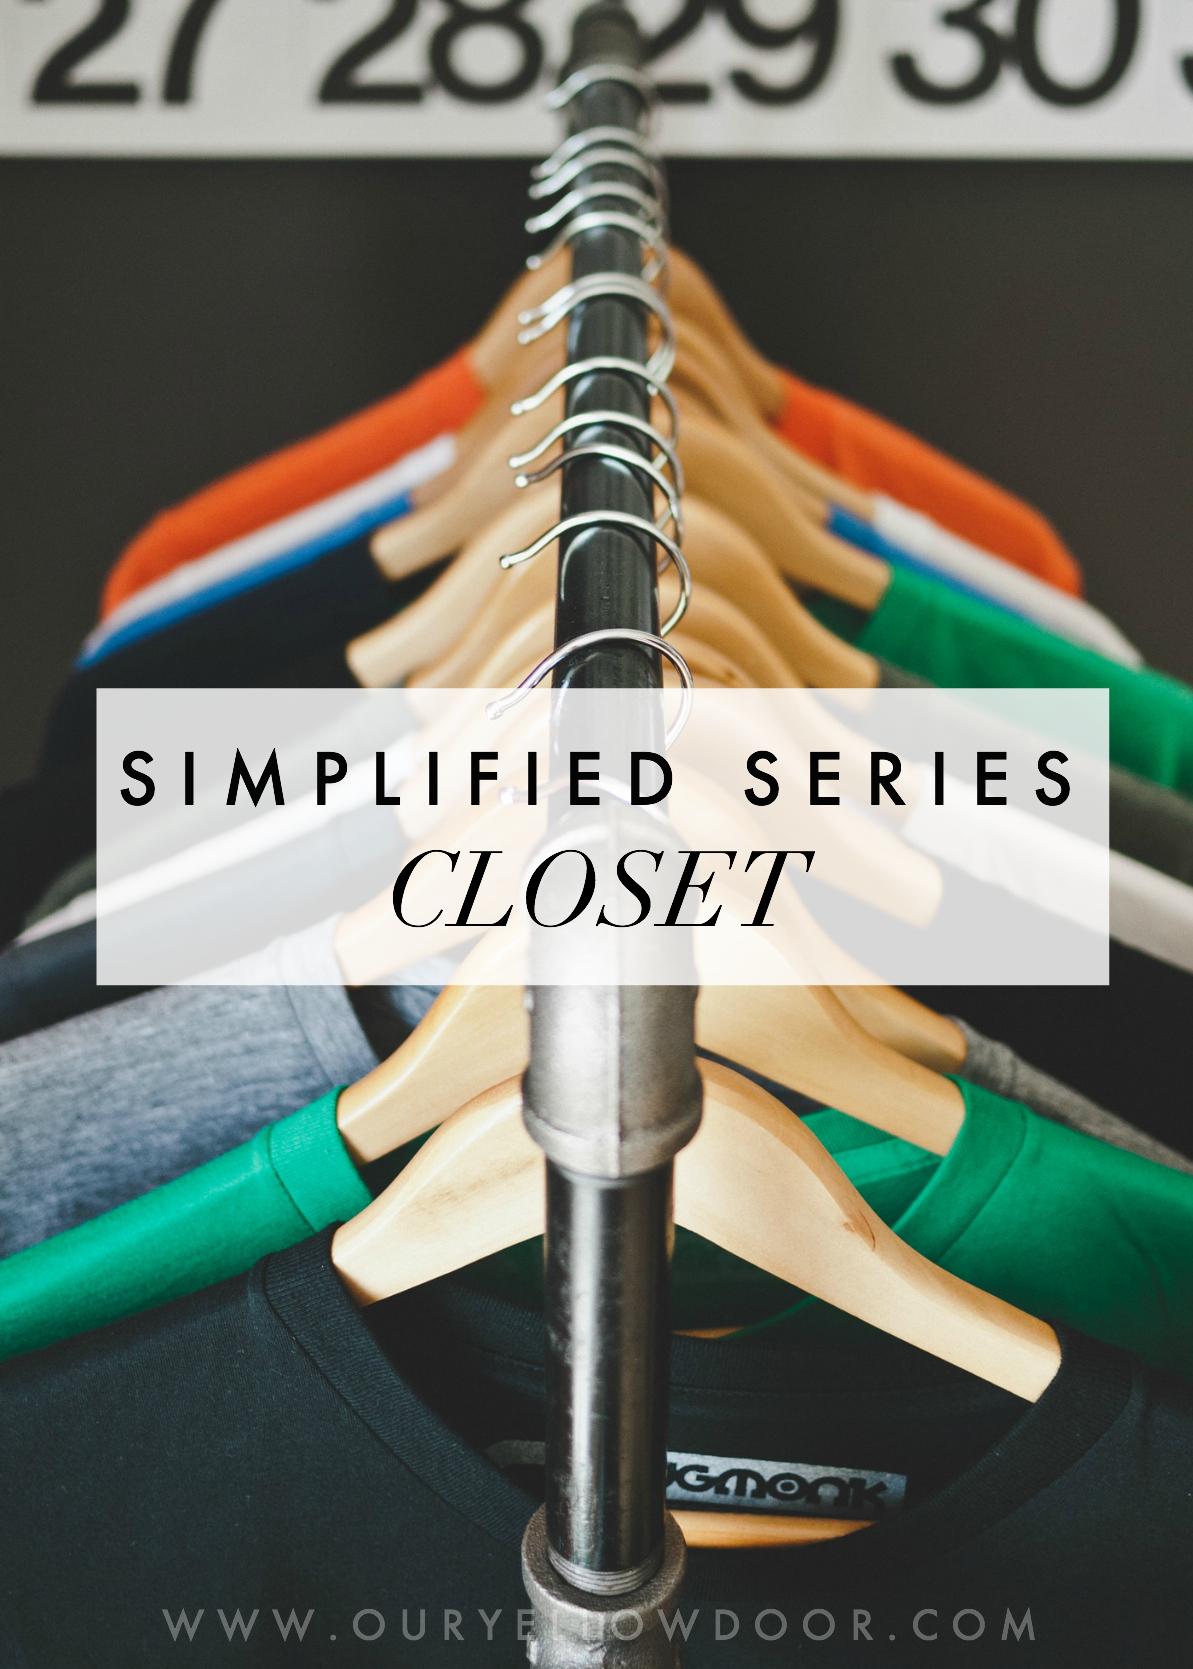 Simplified Series Closet